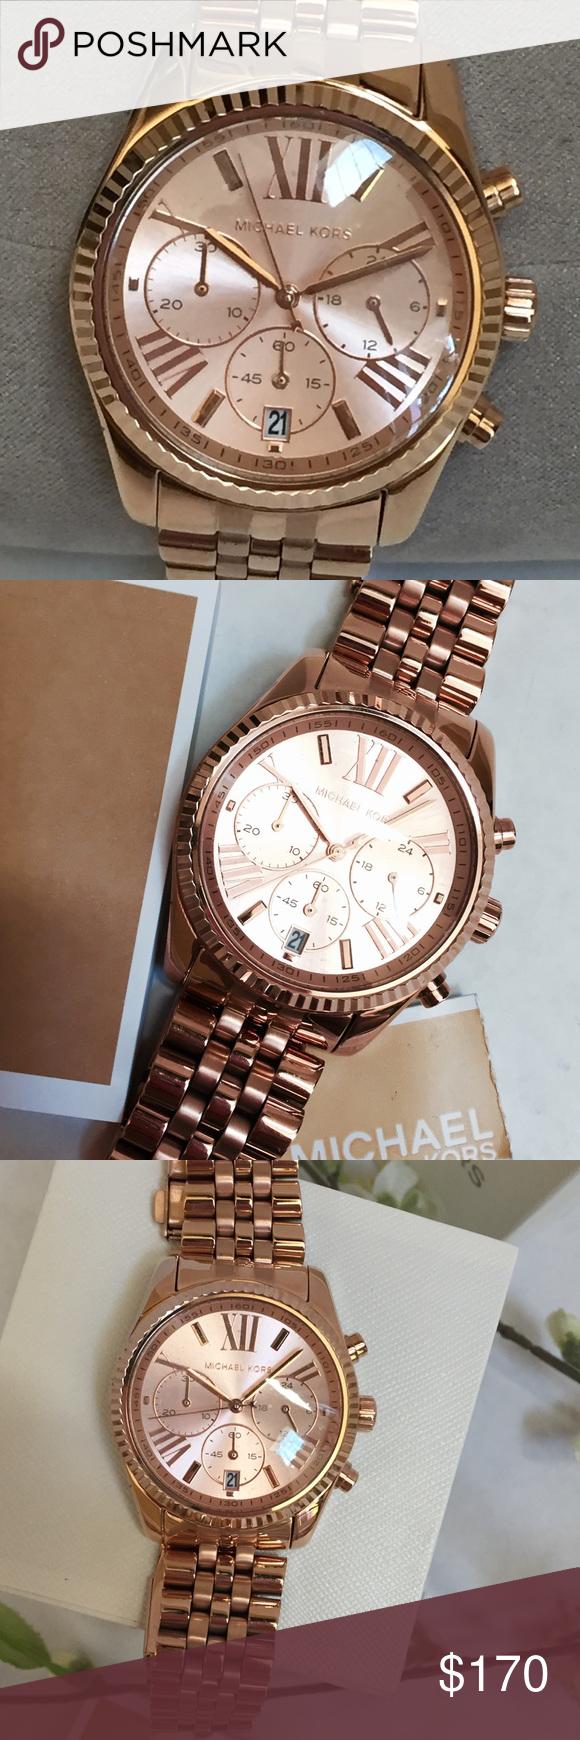 1b55cf6109f2 Michael Kors Lexington Watch MK 5569